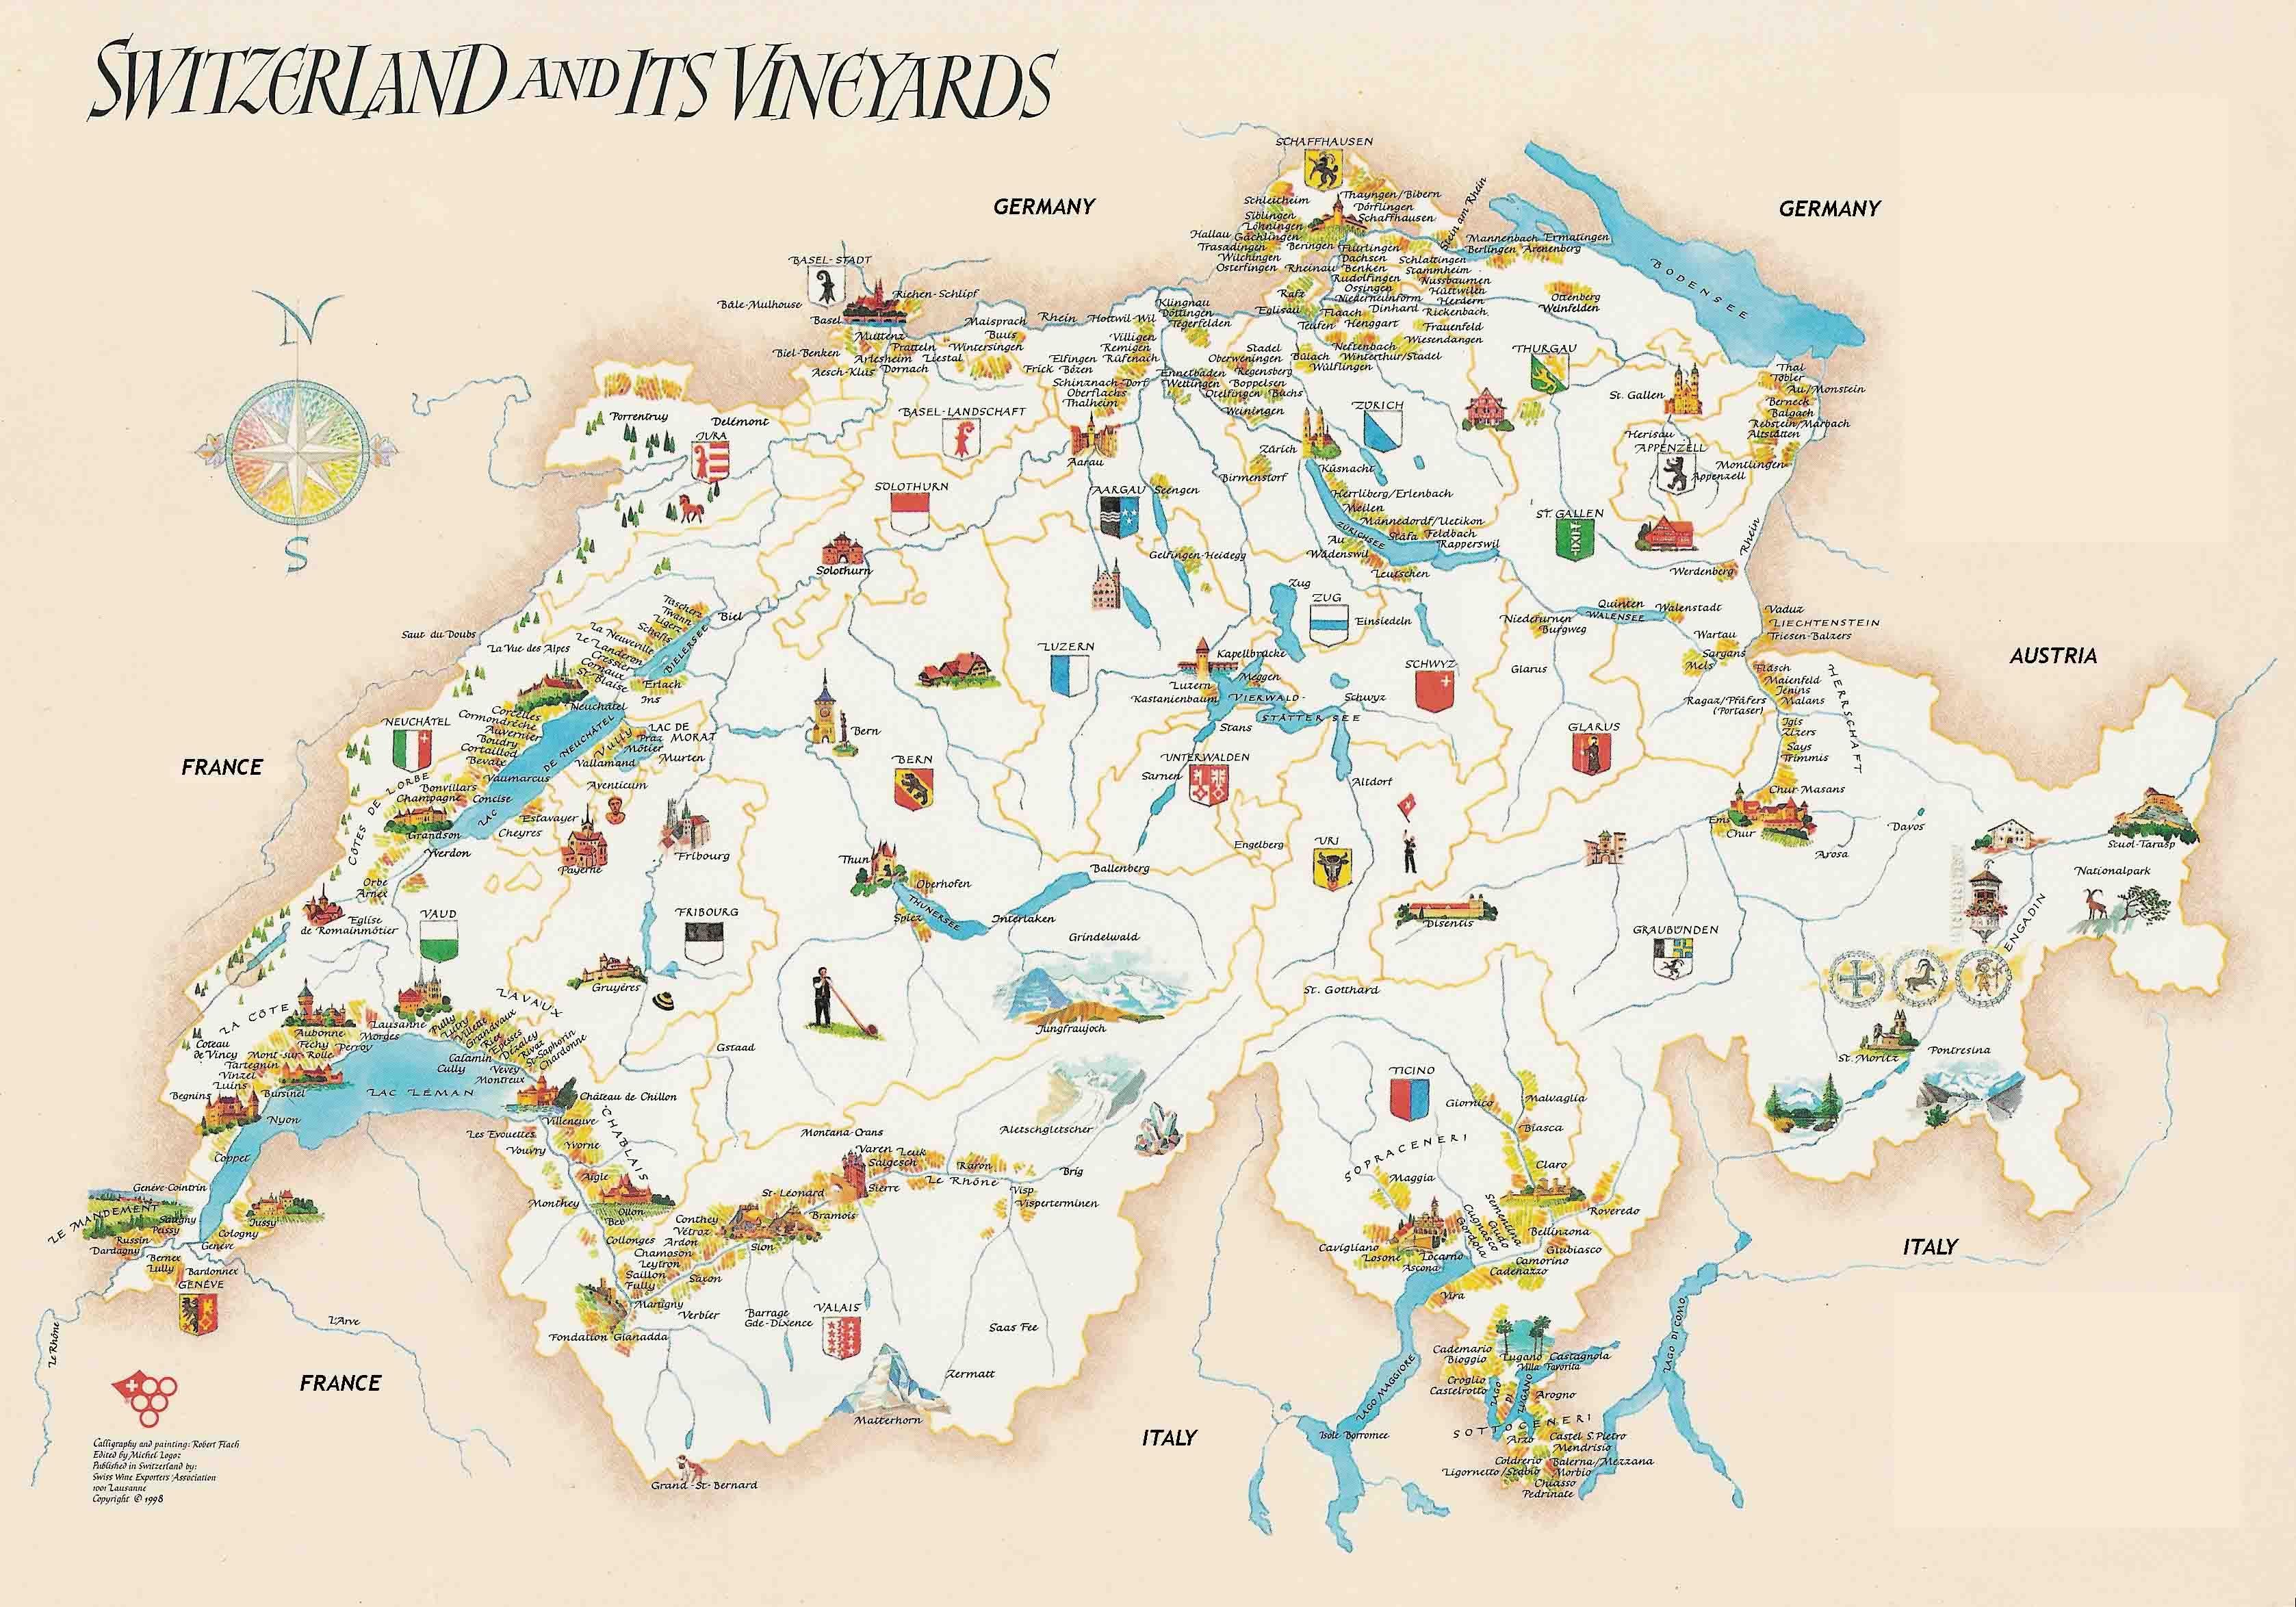 Switzerland Map Switzerland Vineyards Map See Map Details From